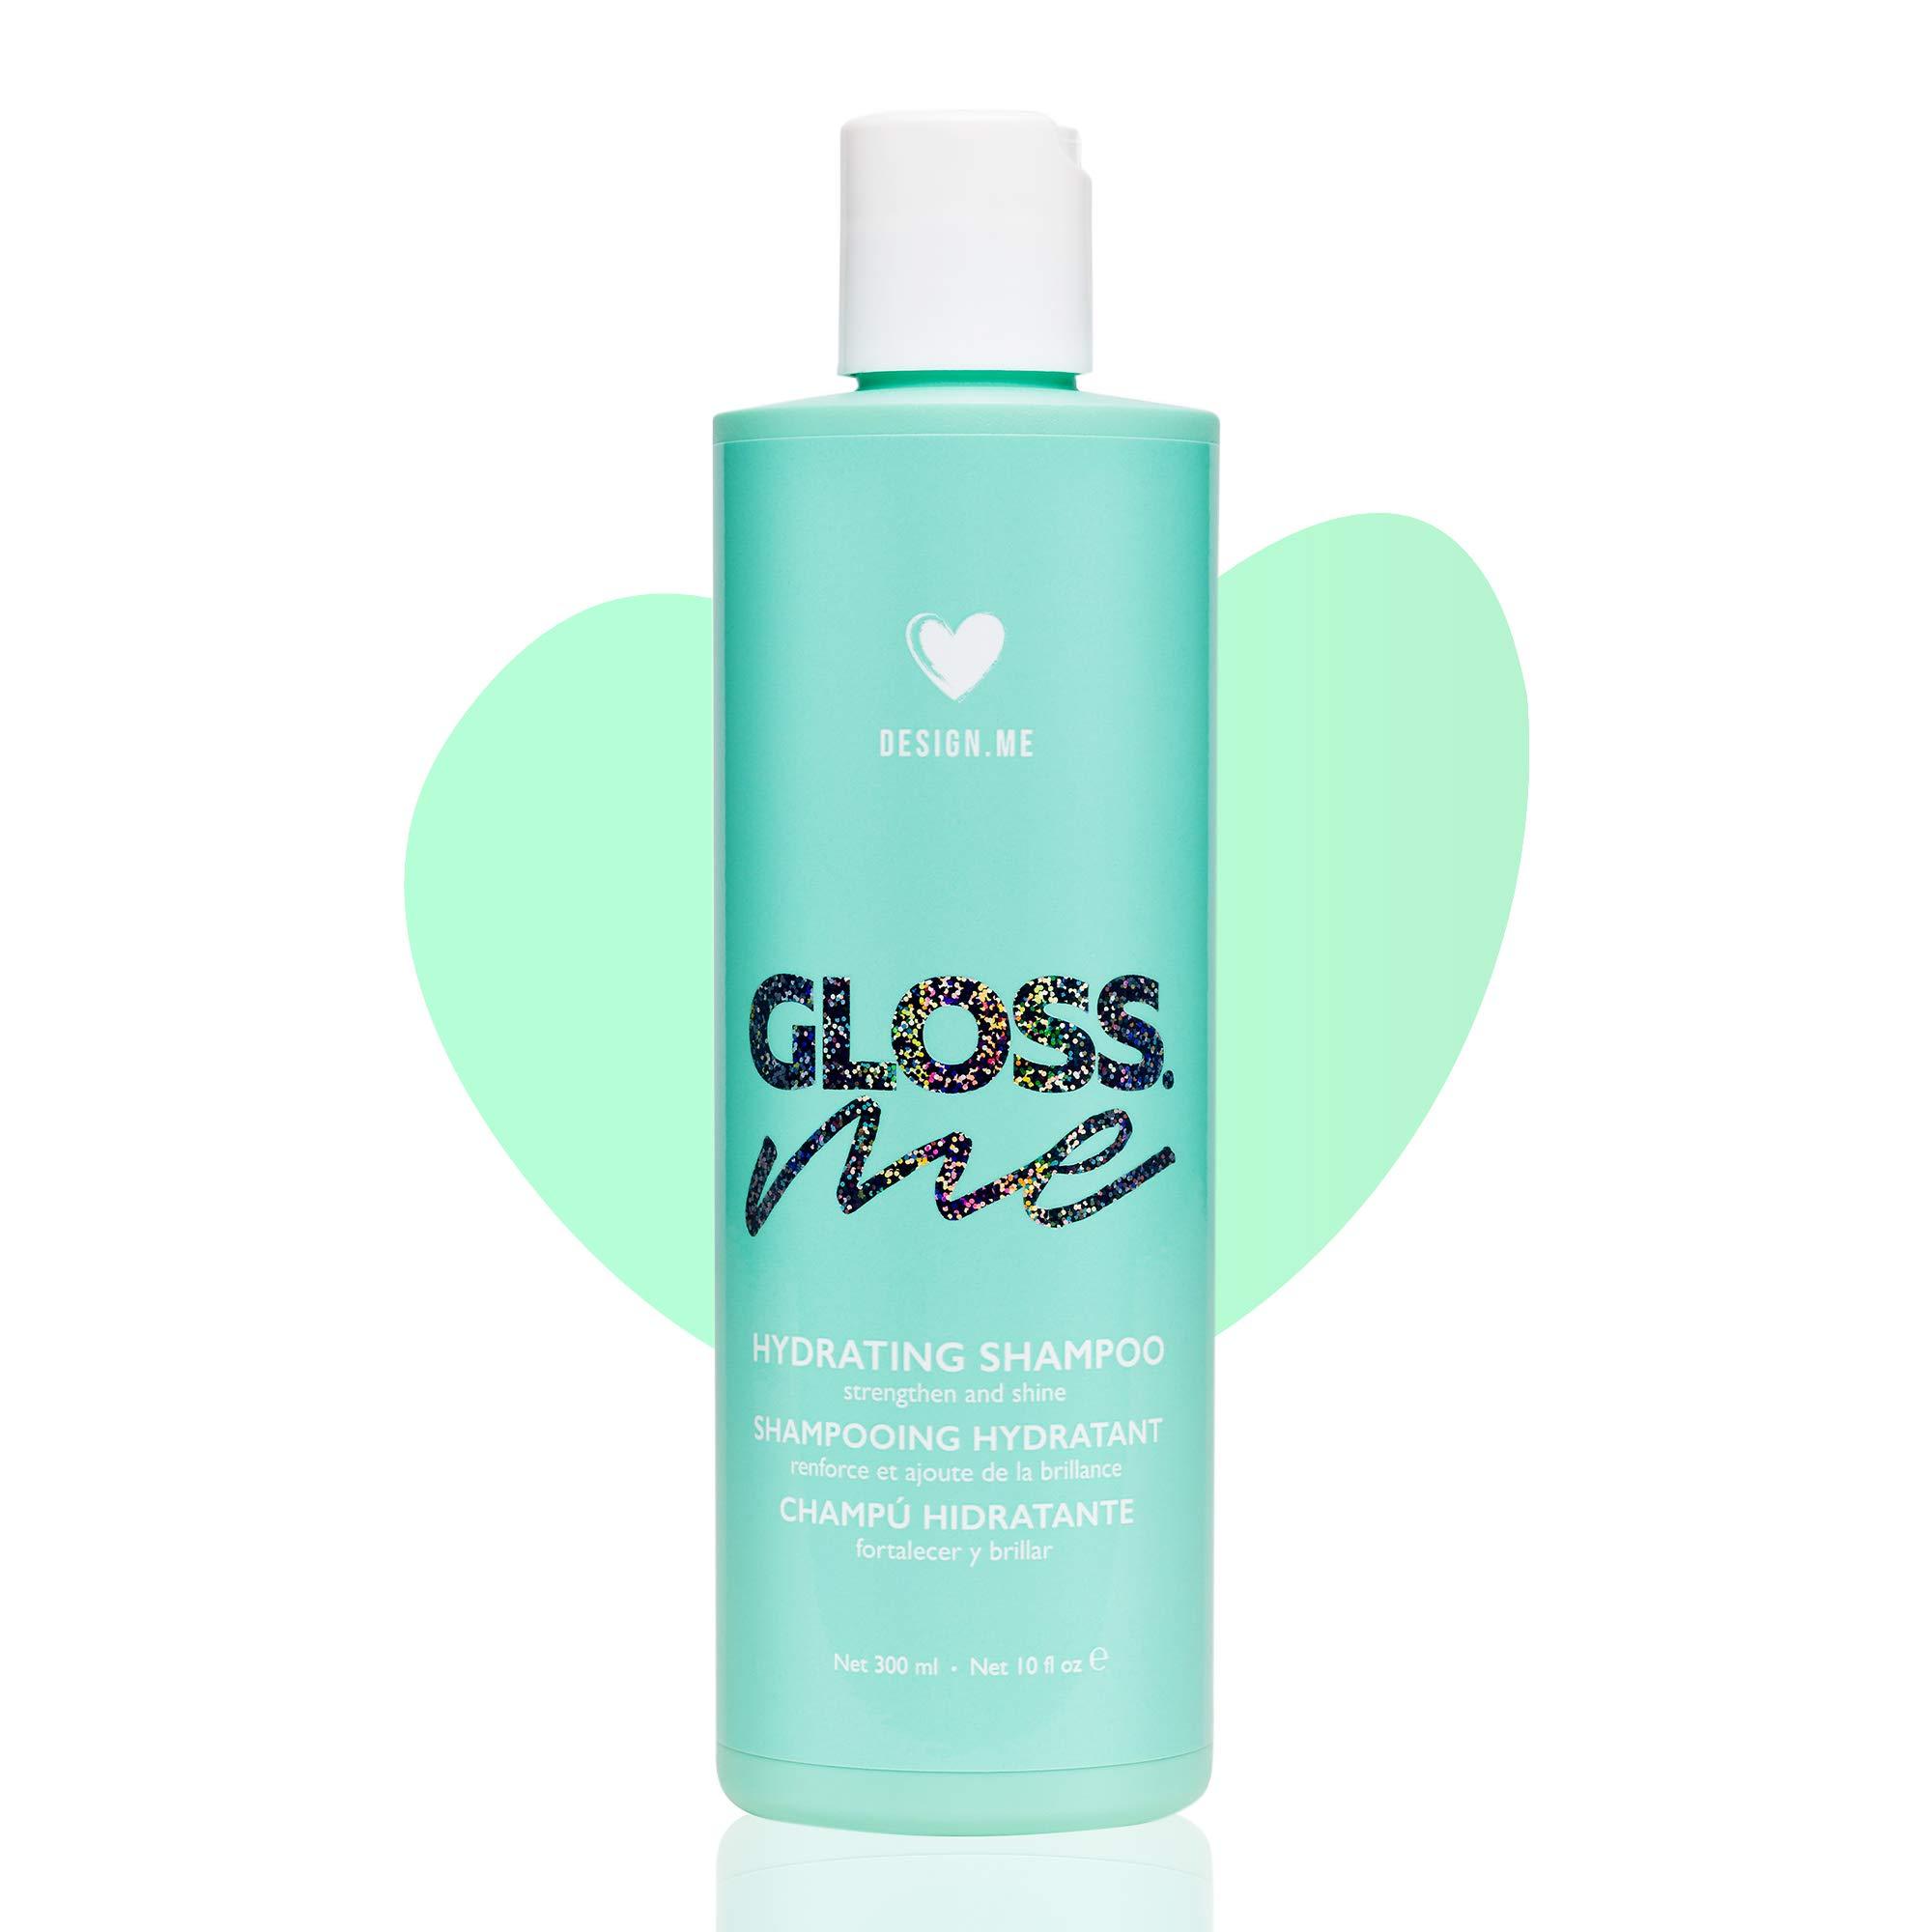 Gloss.ME Hydrating Shampoo, Natural Shampoo with Hemp Oil and Argan Oil, Moisturizing Shampoo for Strong, Soft and Shiny Hair, Sulfate Free Shampoo, Vegan - Design.ME (300ml)